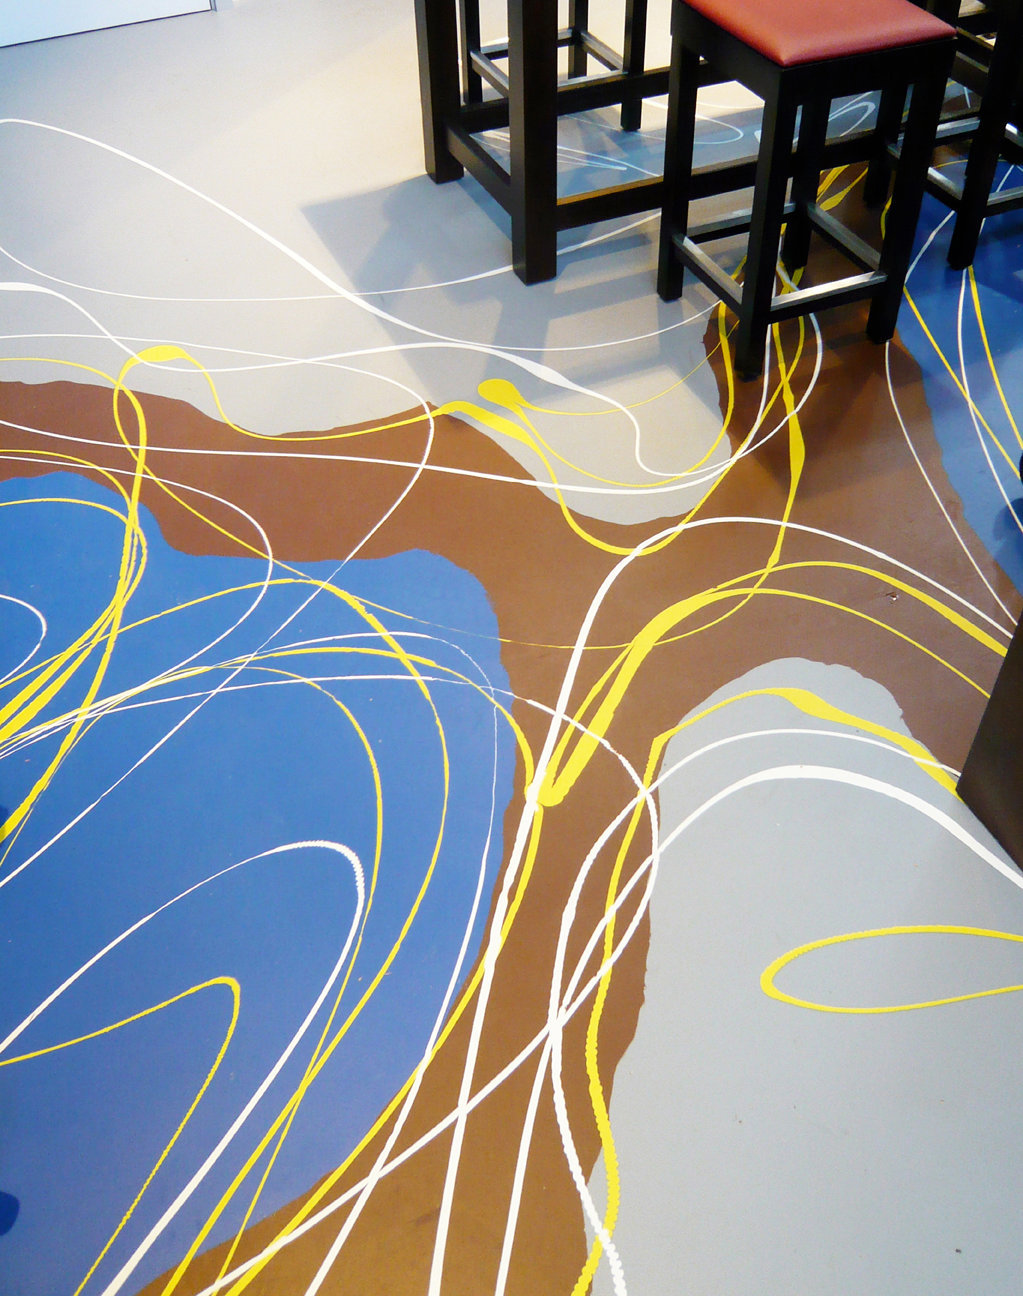 E-Center_Cafeteria_Hamburg_Deutschland_460qm_2010_72dpi.jpg